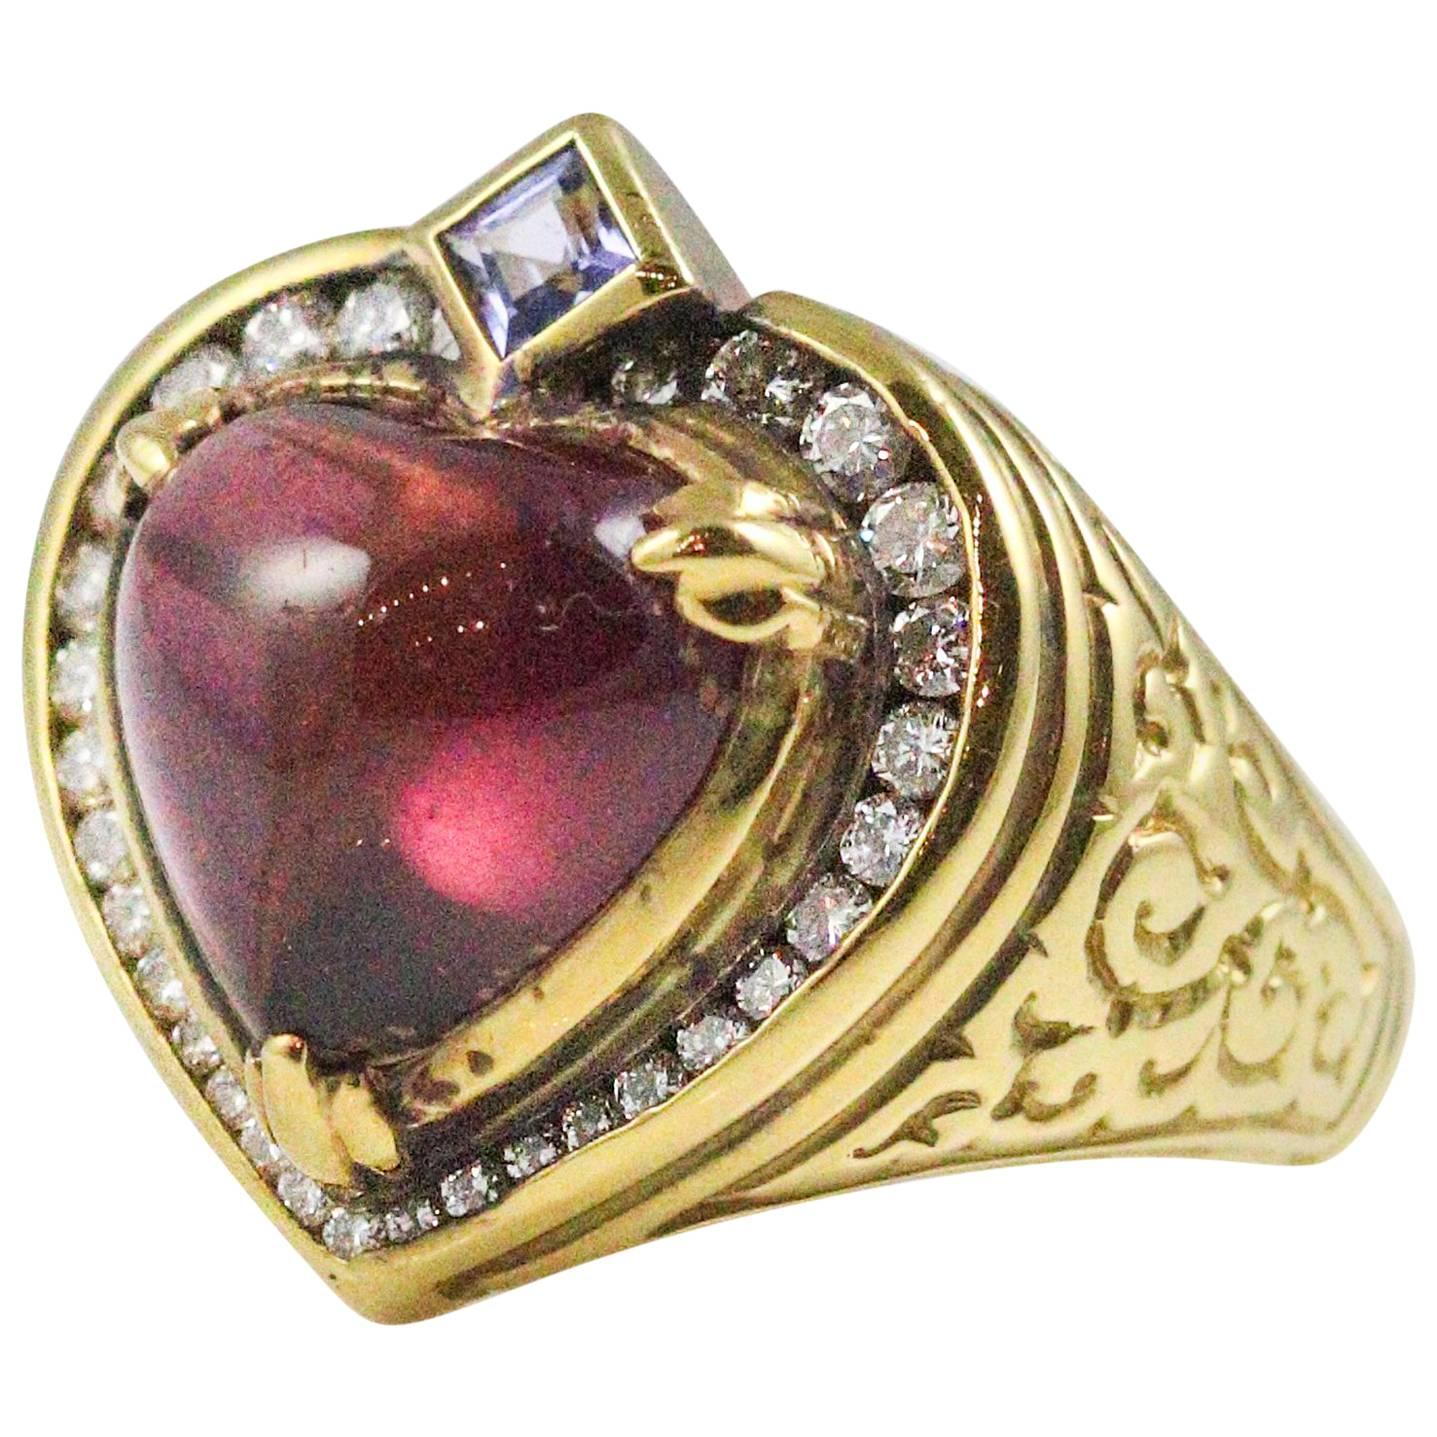 Seidengang 18 Karat Yellow Gold Heart Shaped Rubellite Tourmaline Ring